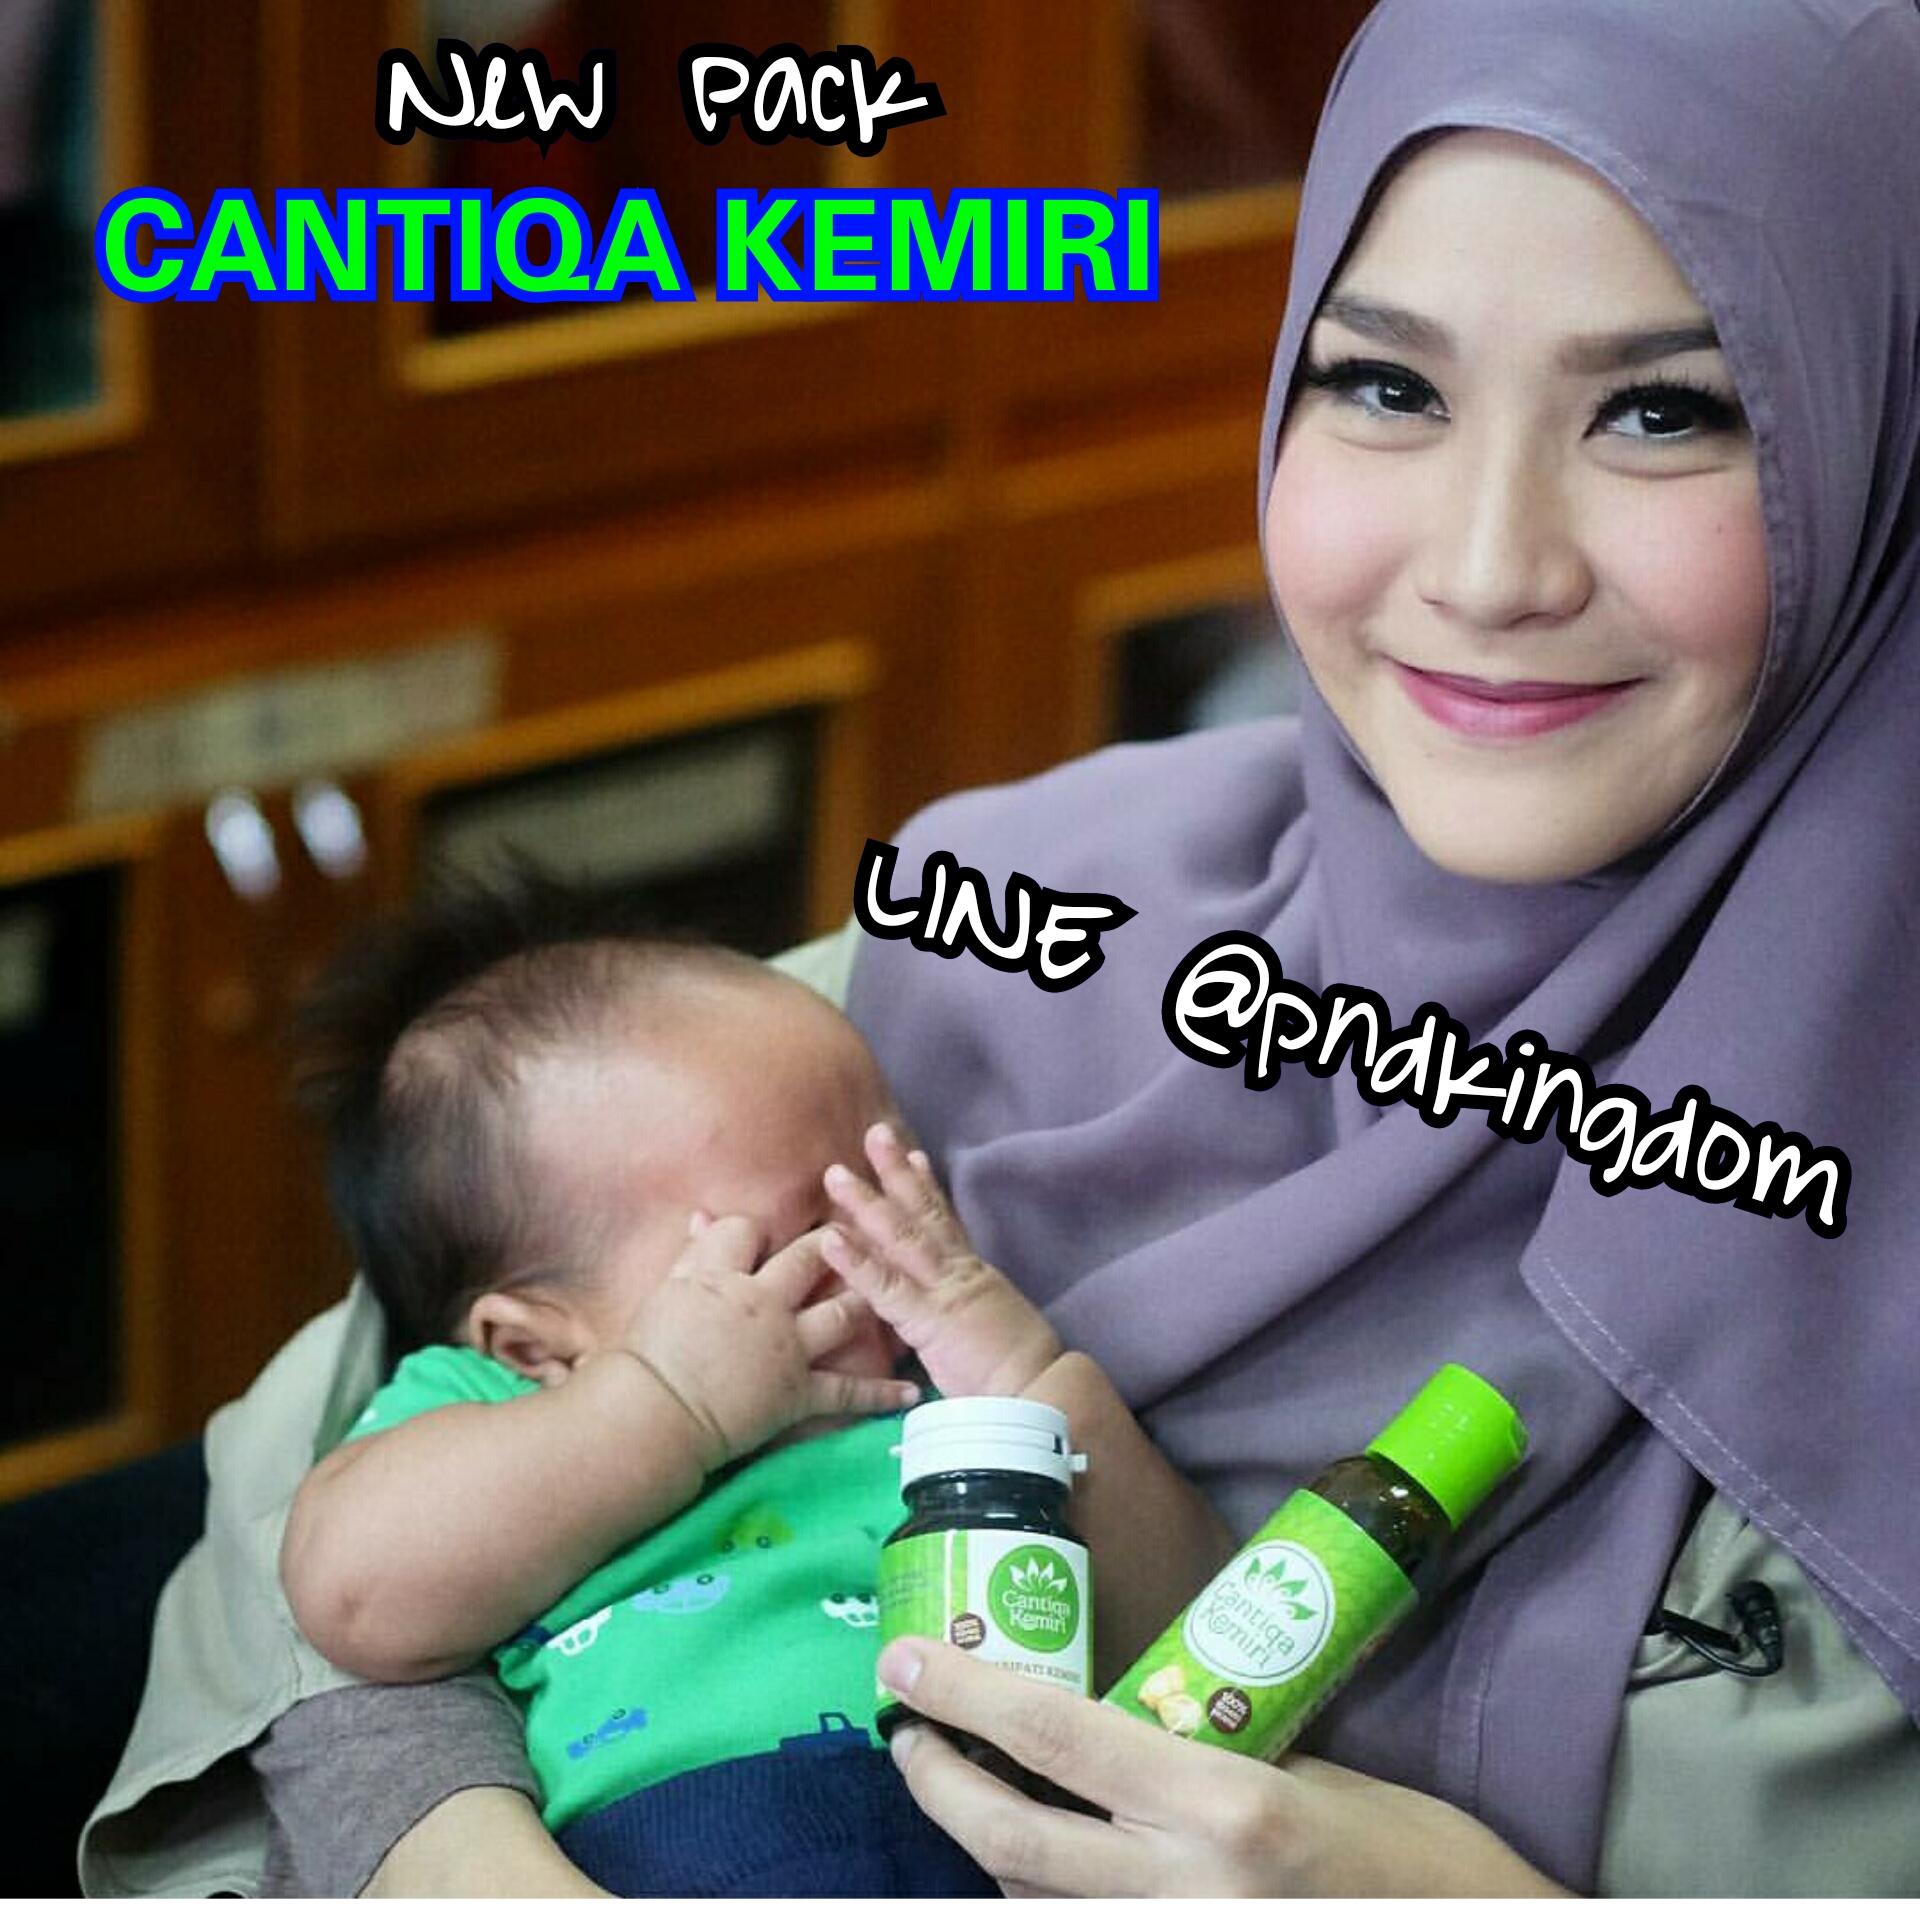 (Best Seller) Penyubur Rambut Herbal Cantiqa Kemiri  - Blanja.com